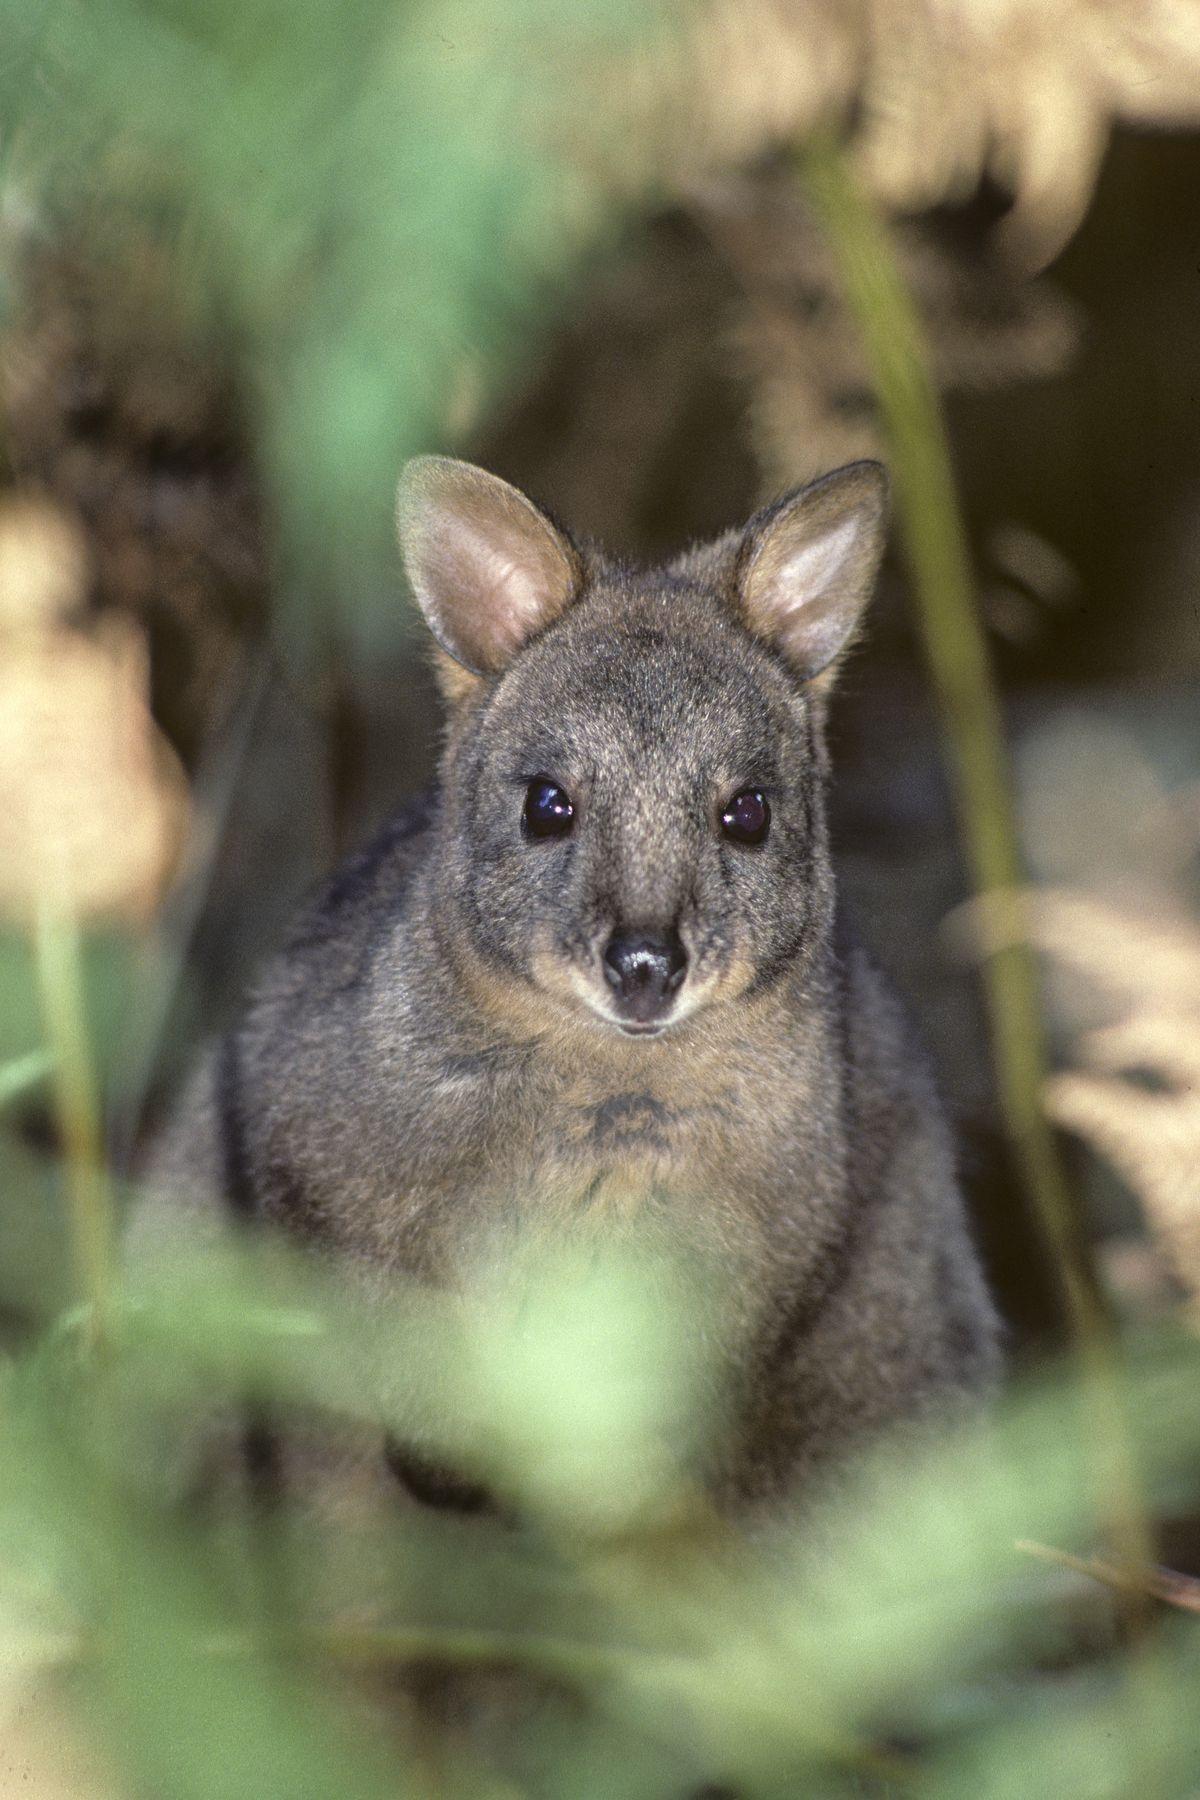 A pademelon gazing straight toward the camera, ears forward, through some foliage.